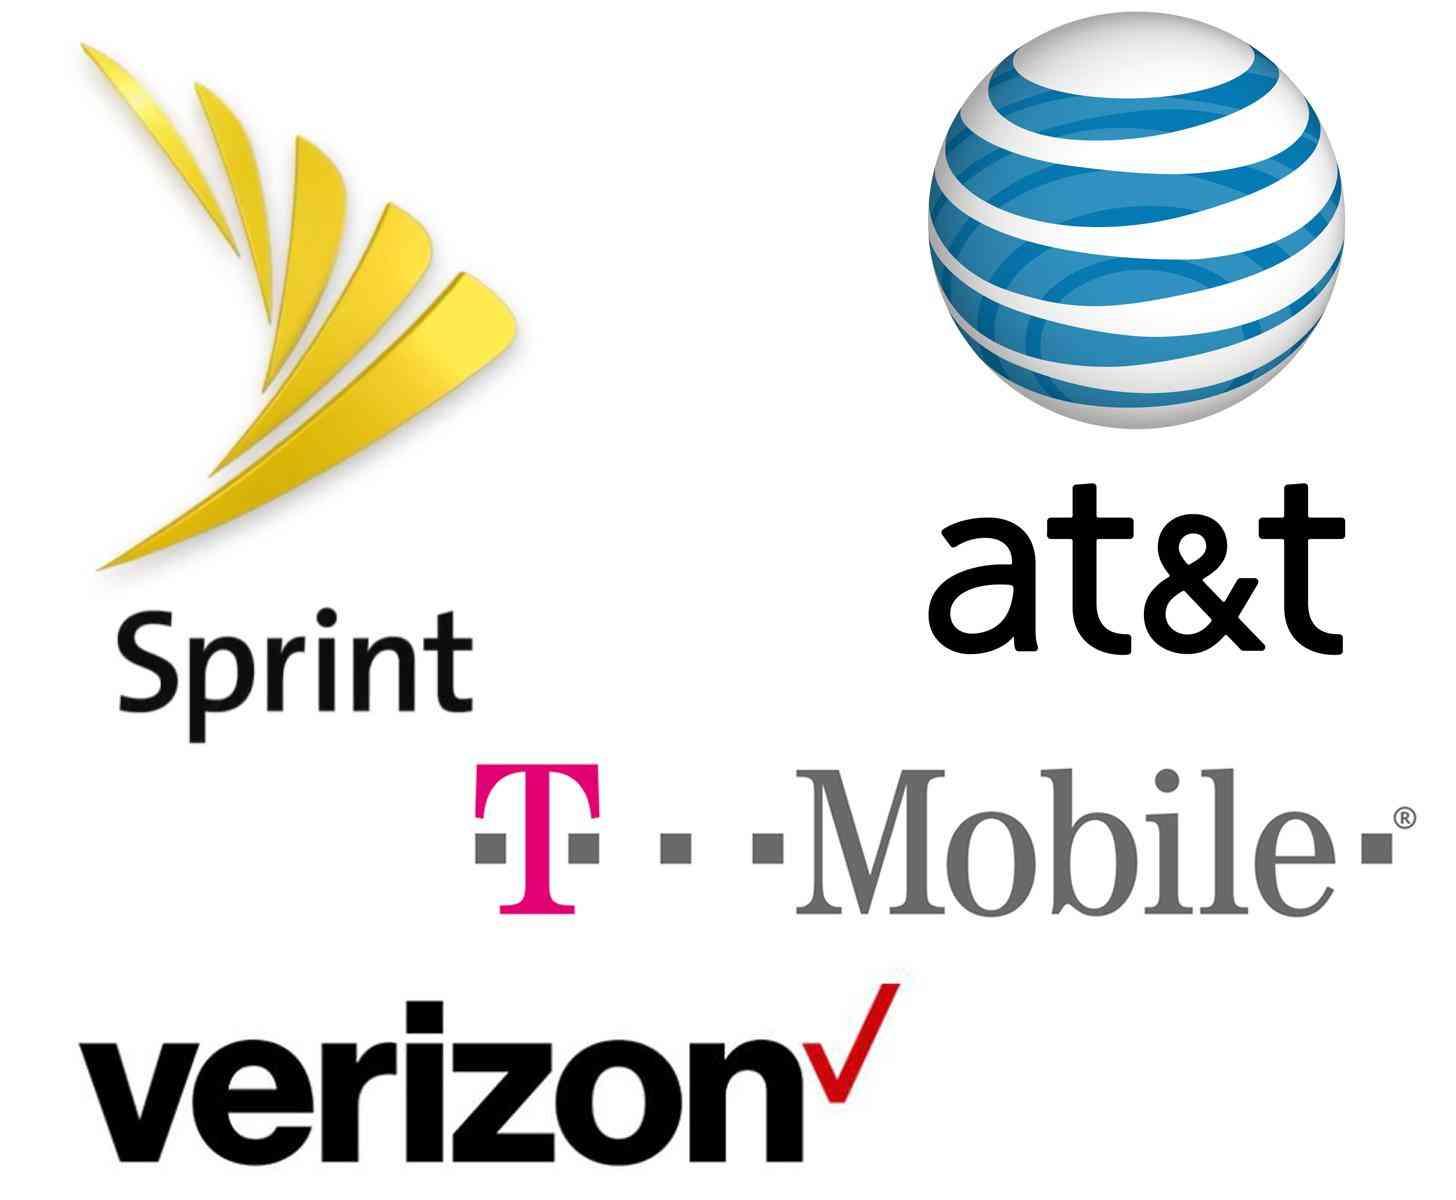 Four major US carrier logos large